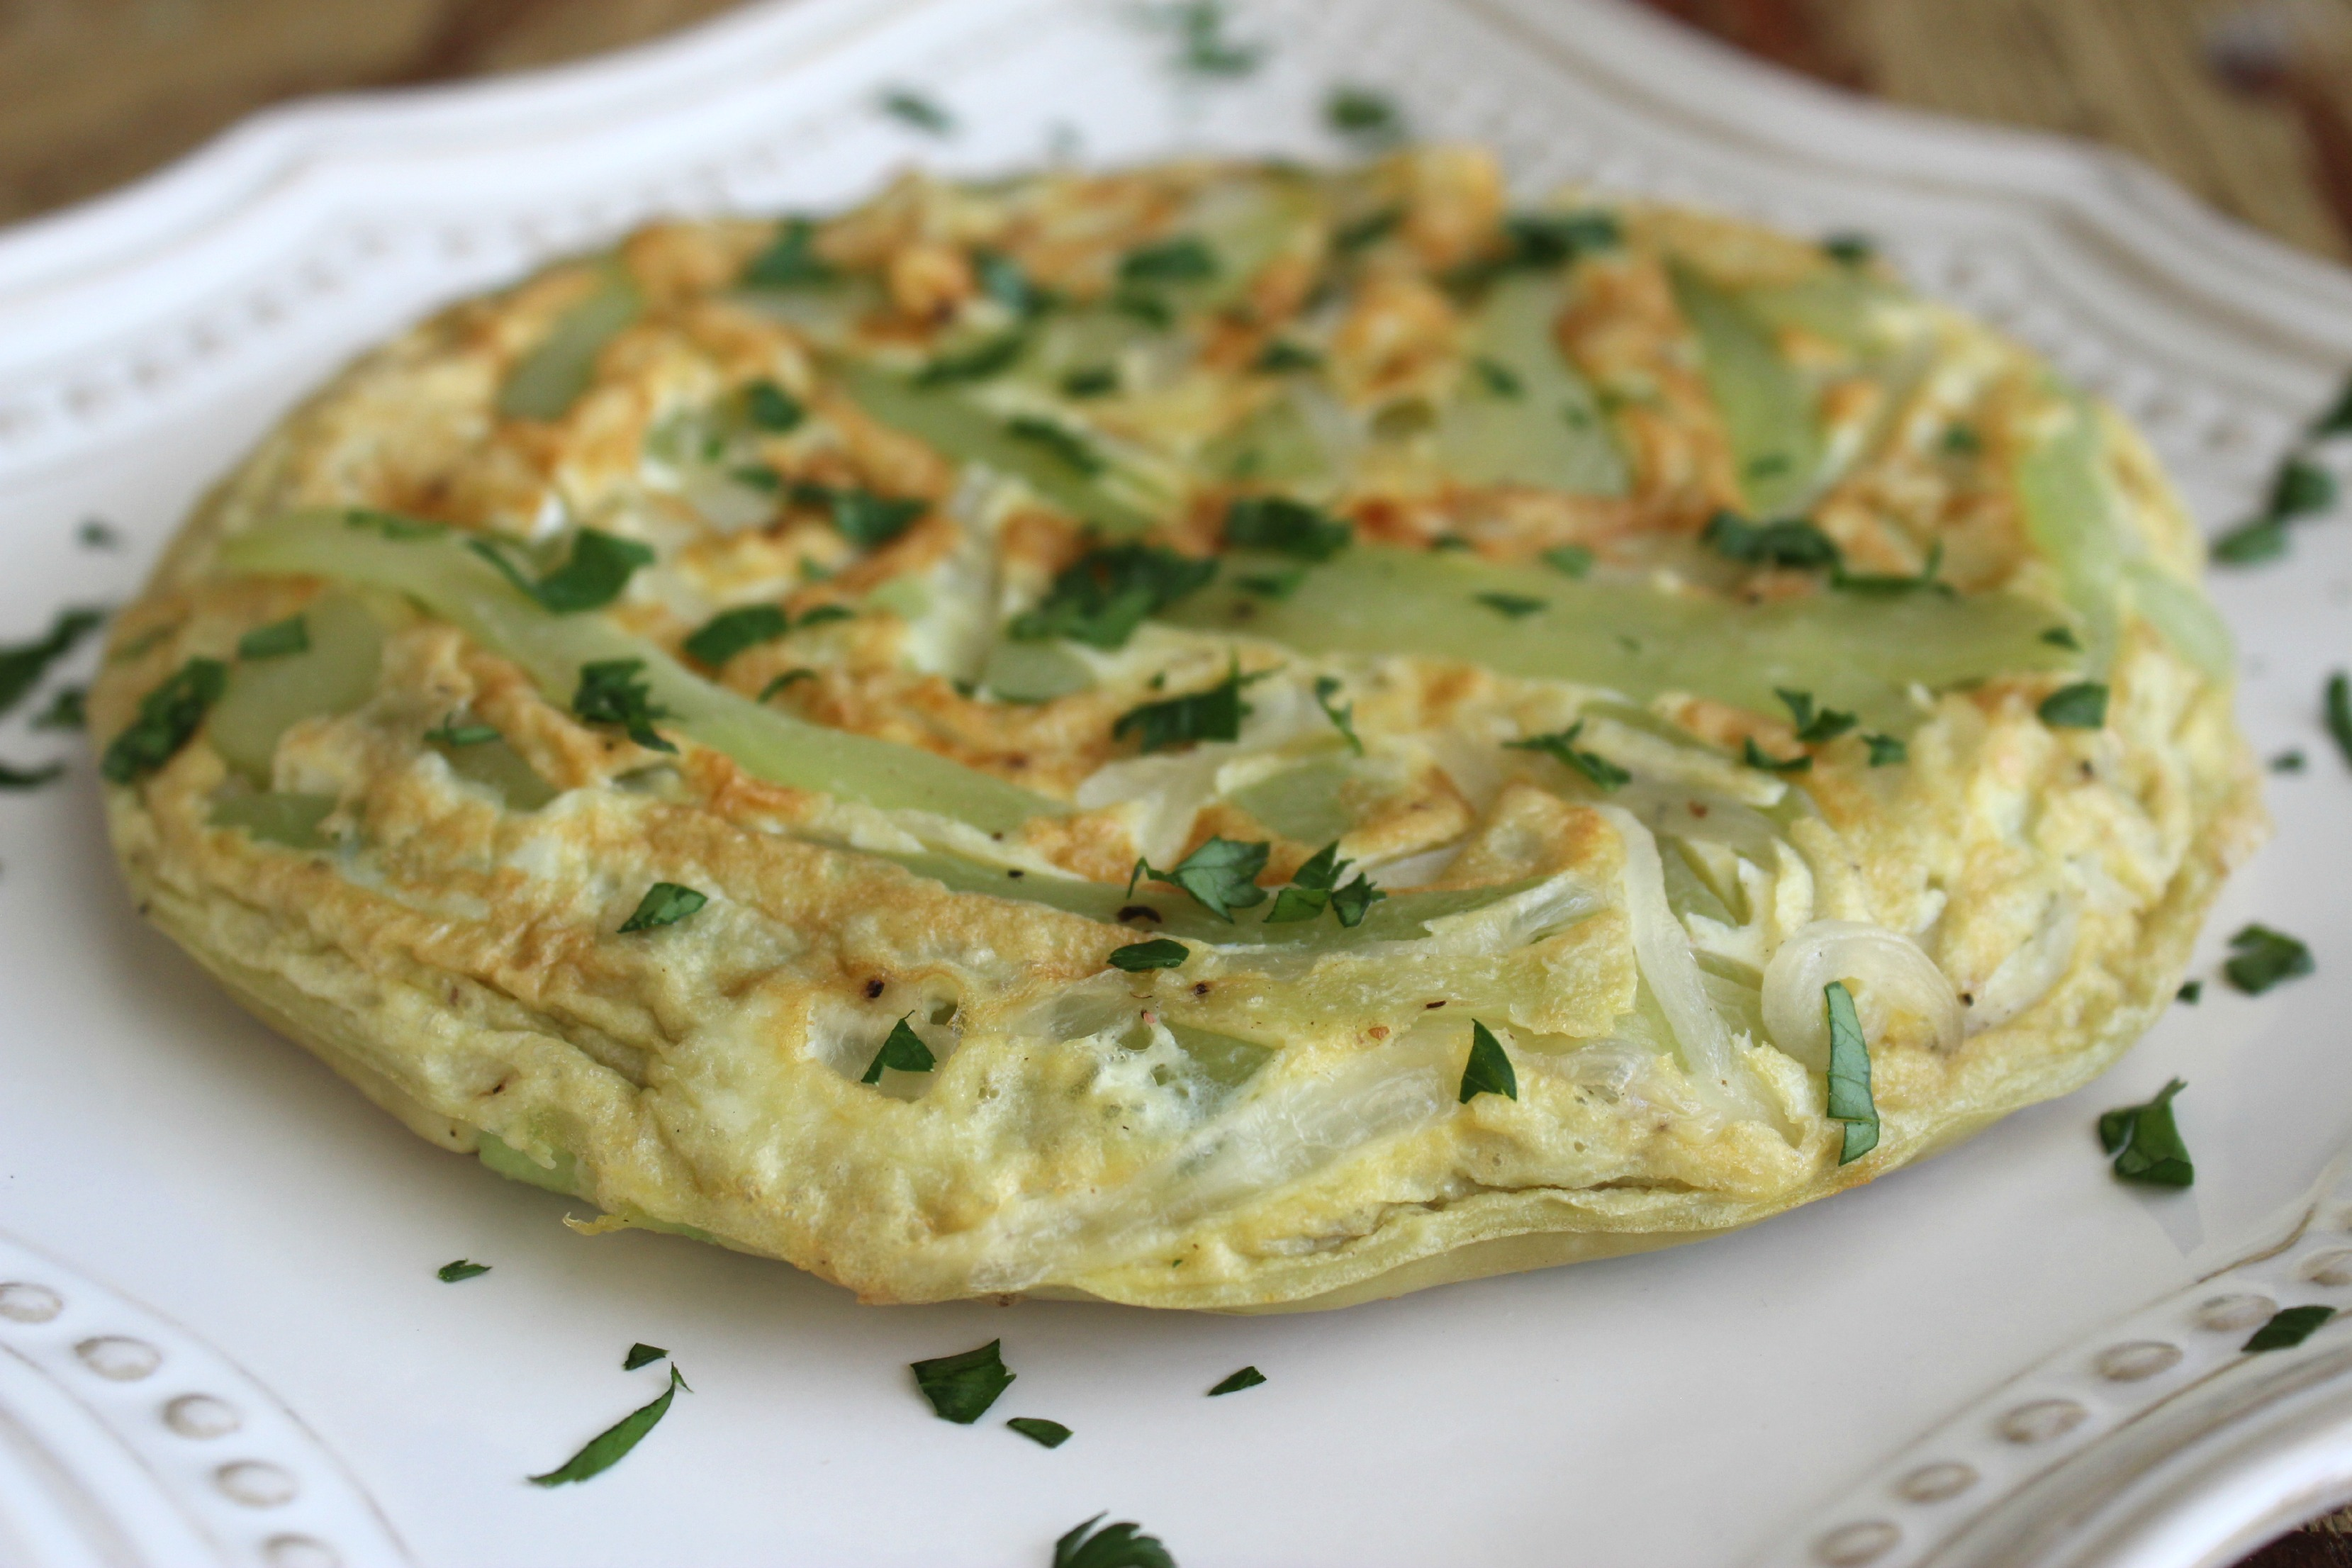 Tortilla Espa Ola Fit Con Chayota ~ Tortilla De Patatas Baja En Calorias